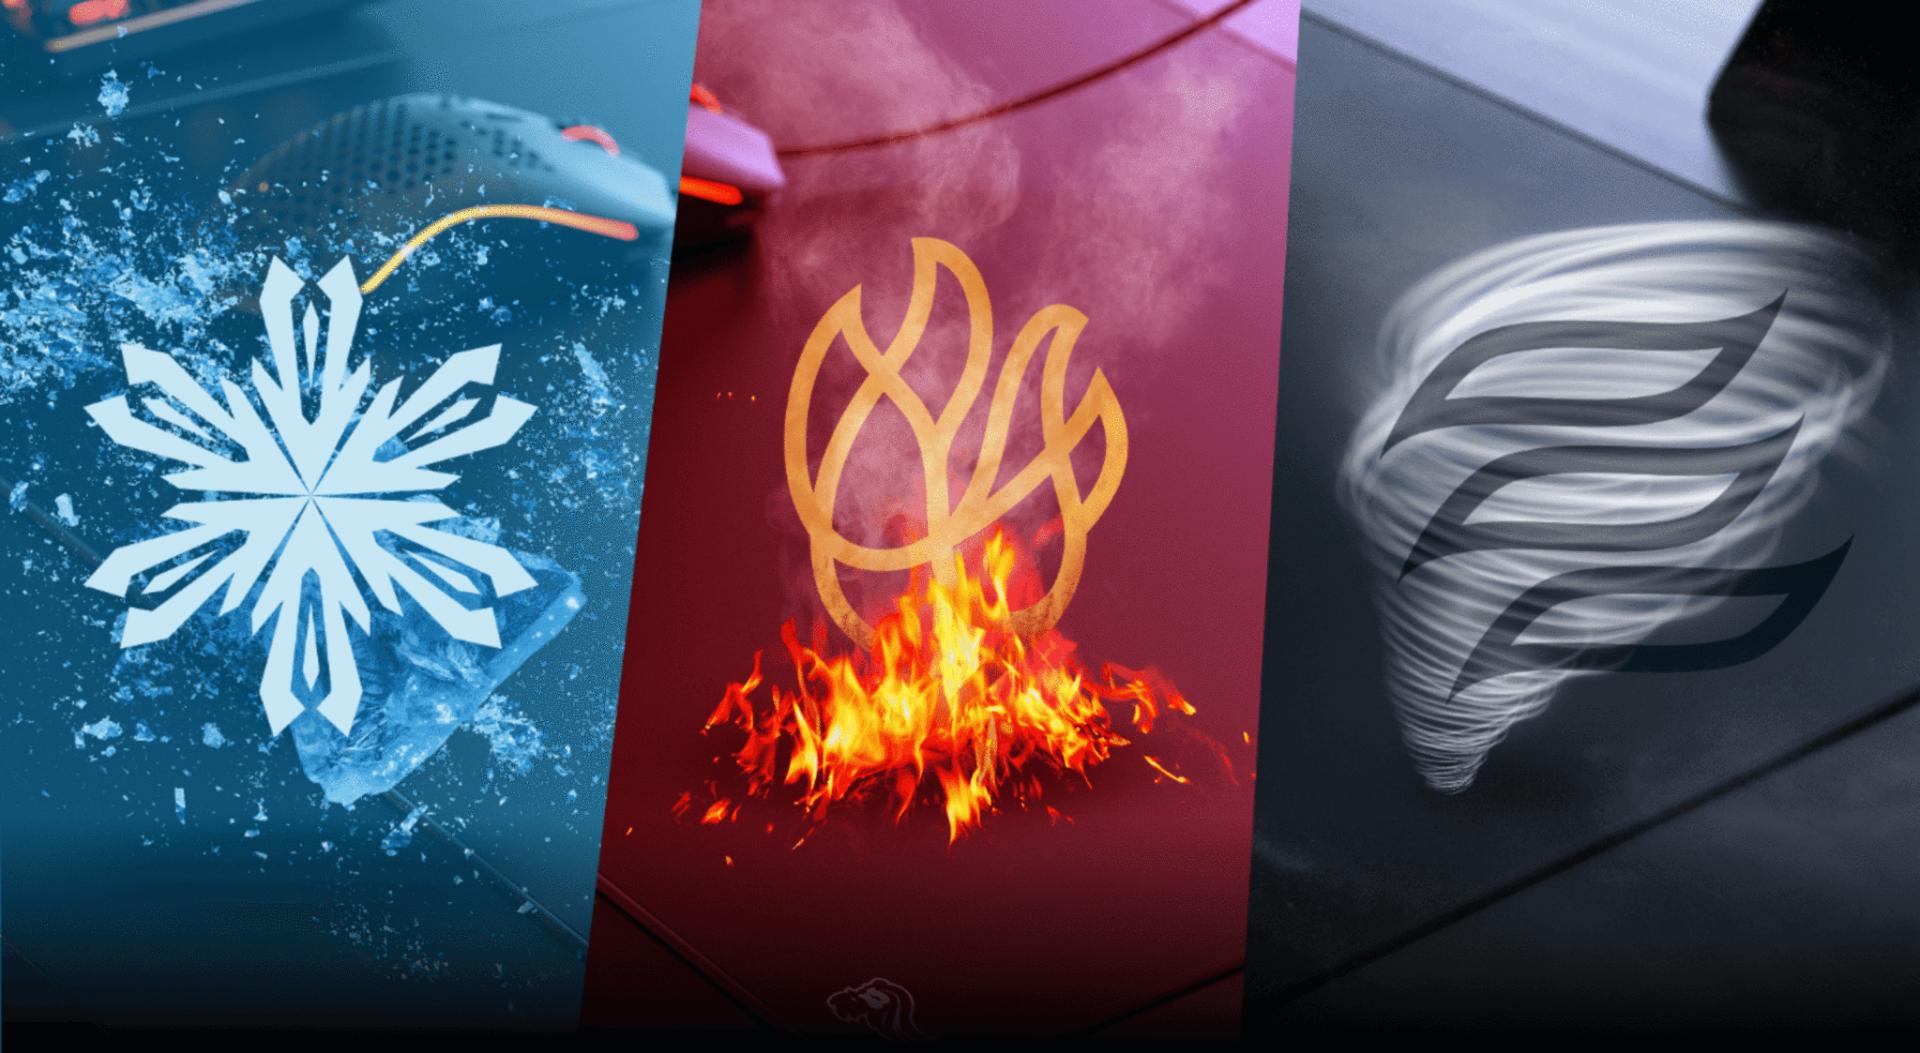 Glorious Element Mouse Pad | Buy & Shop Online - Zayoom Kuwait